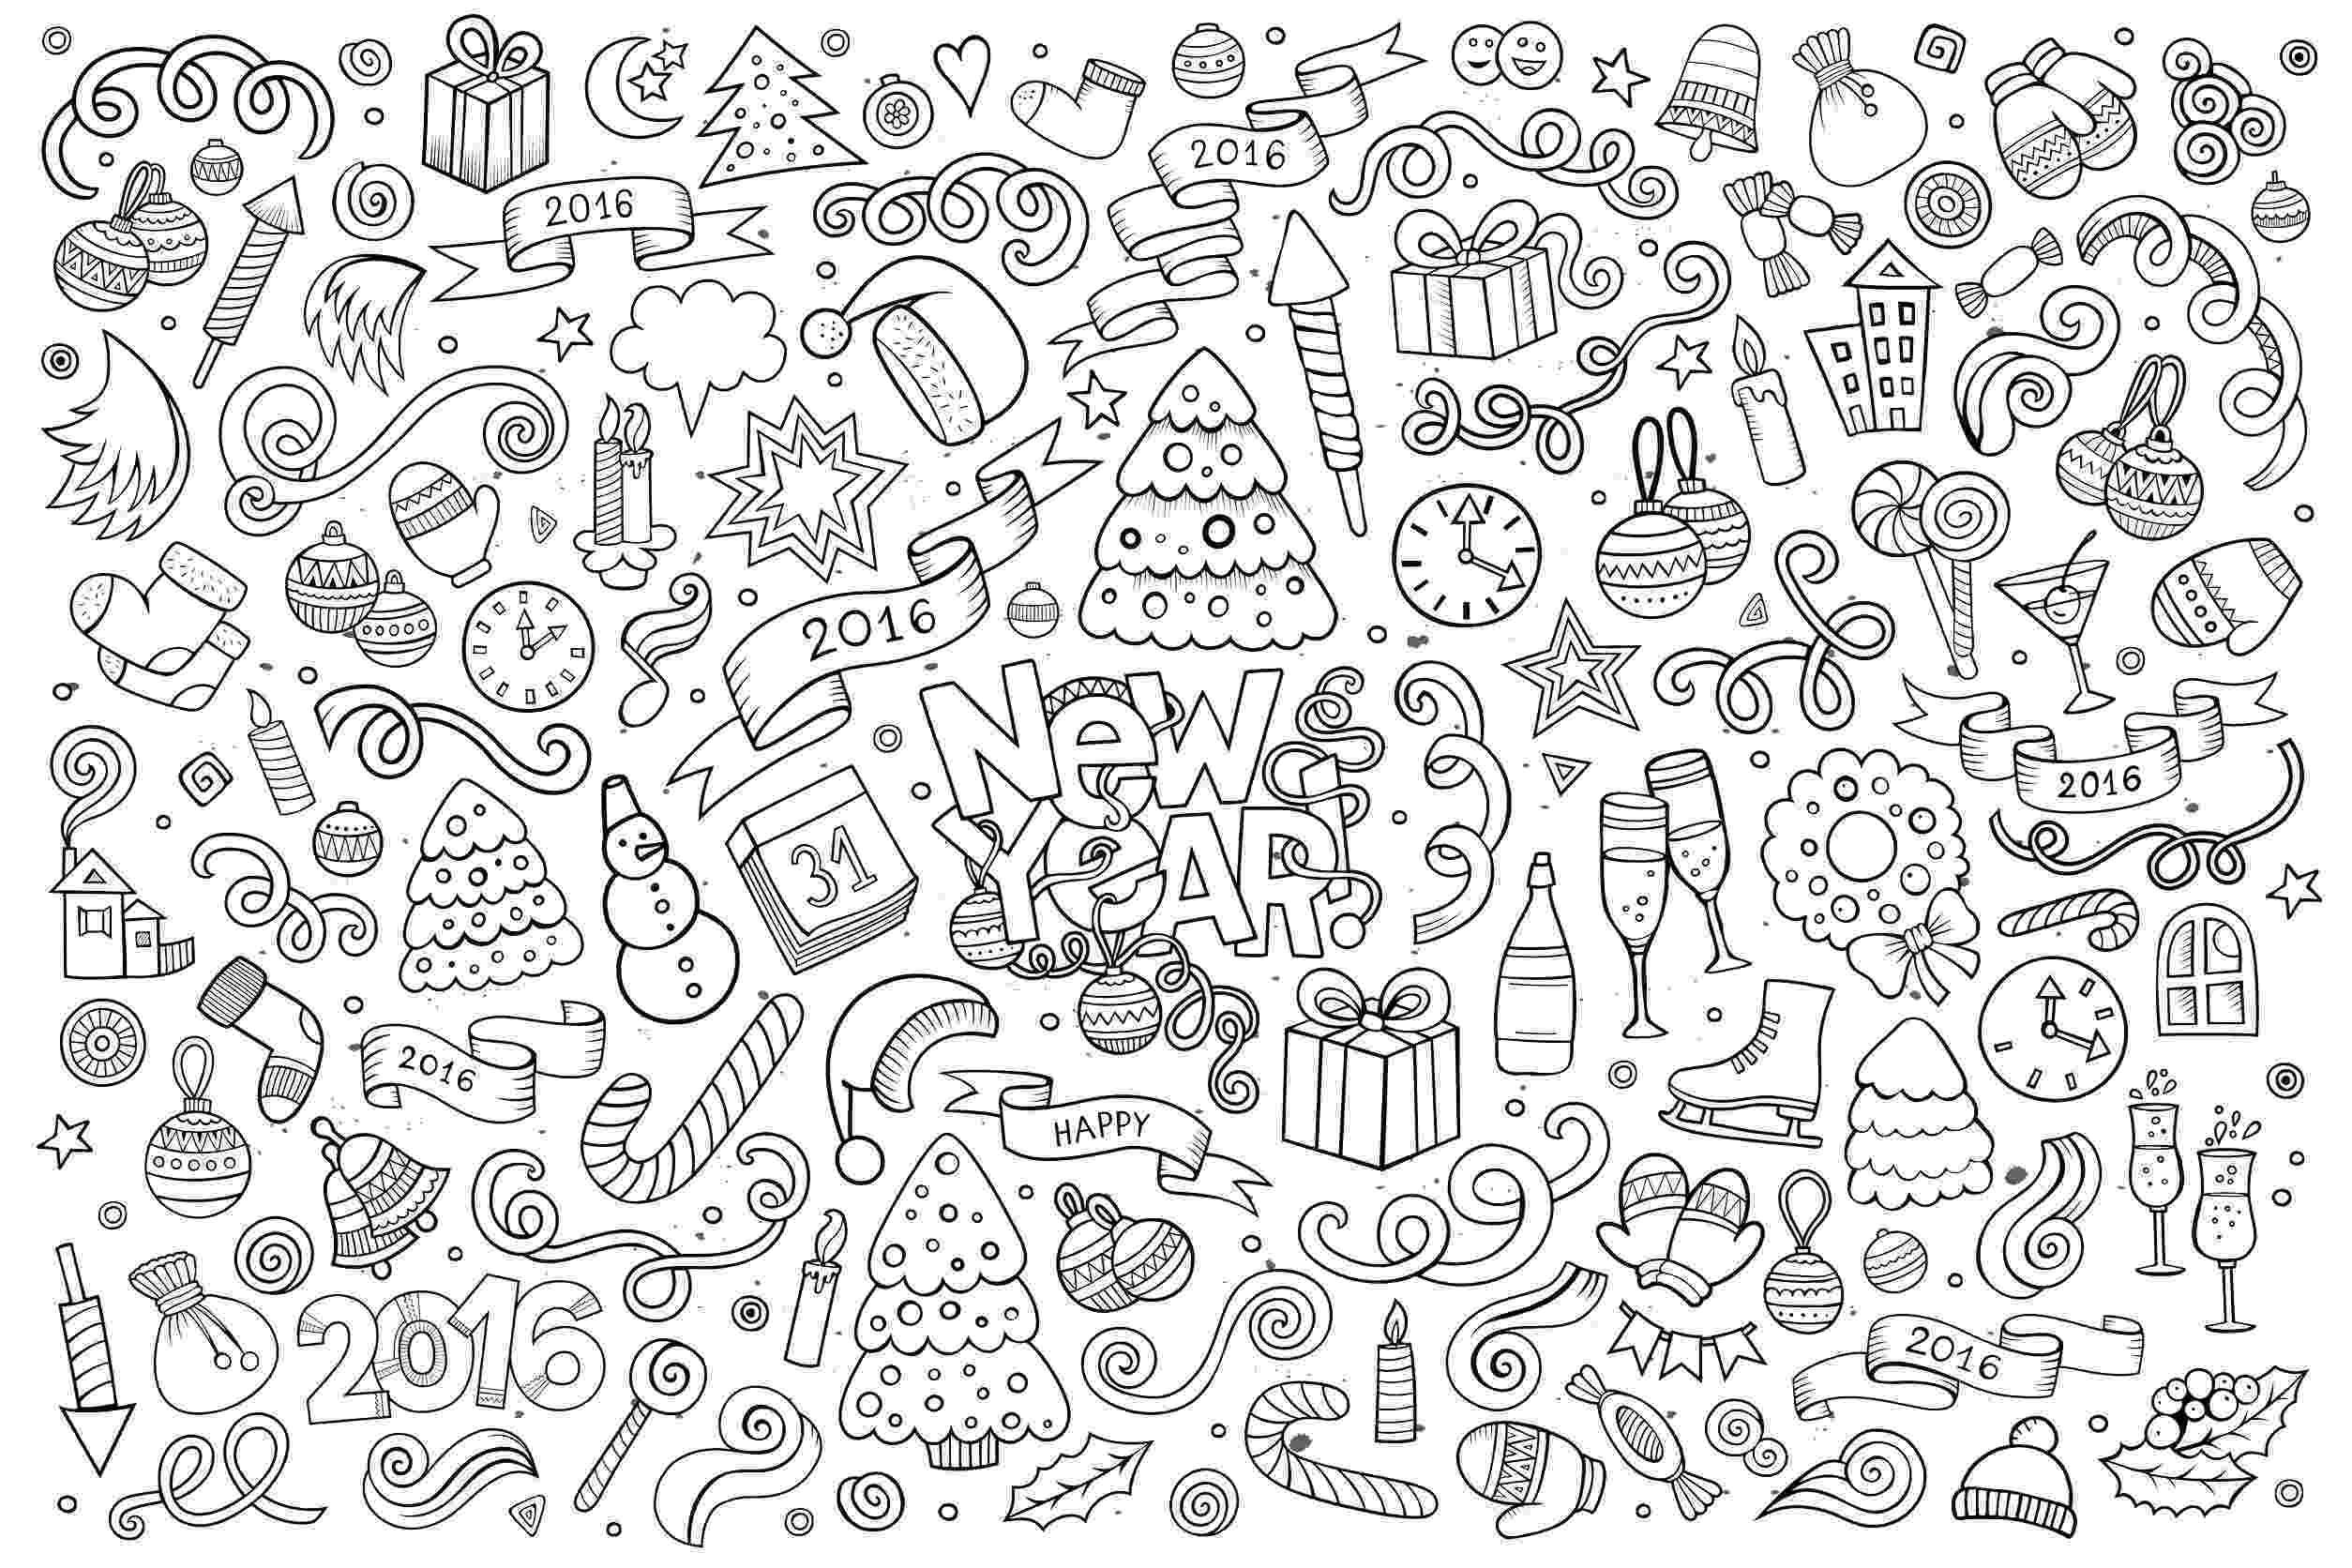 doodle art printables strange creatures doodle art doodling adult coloring pages doodle art printables